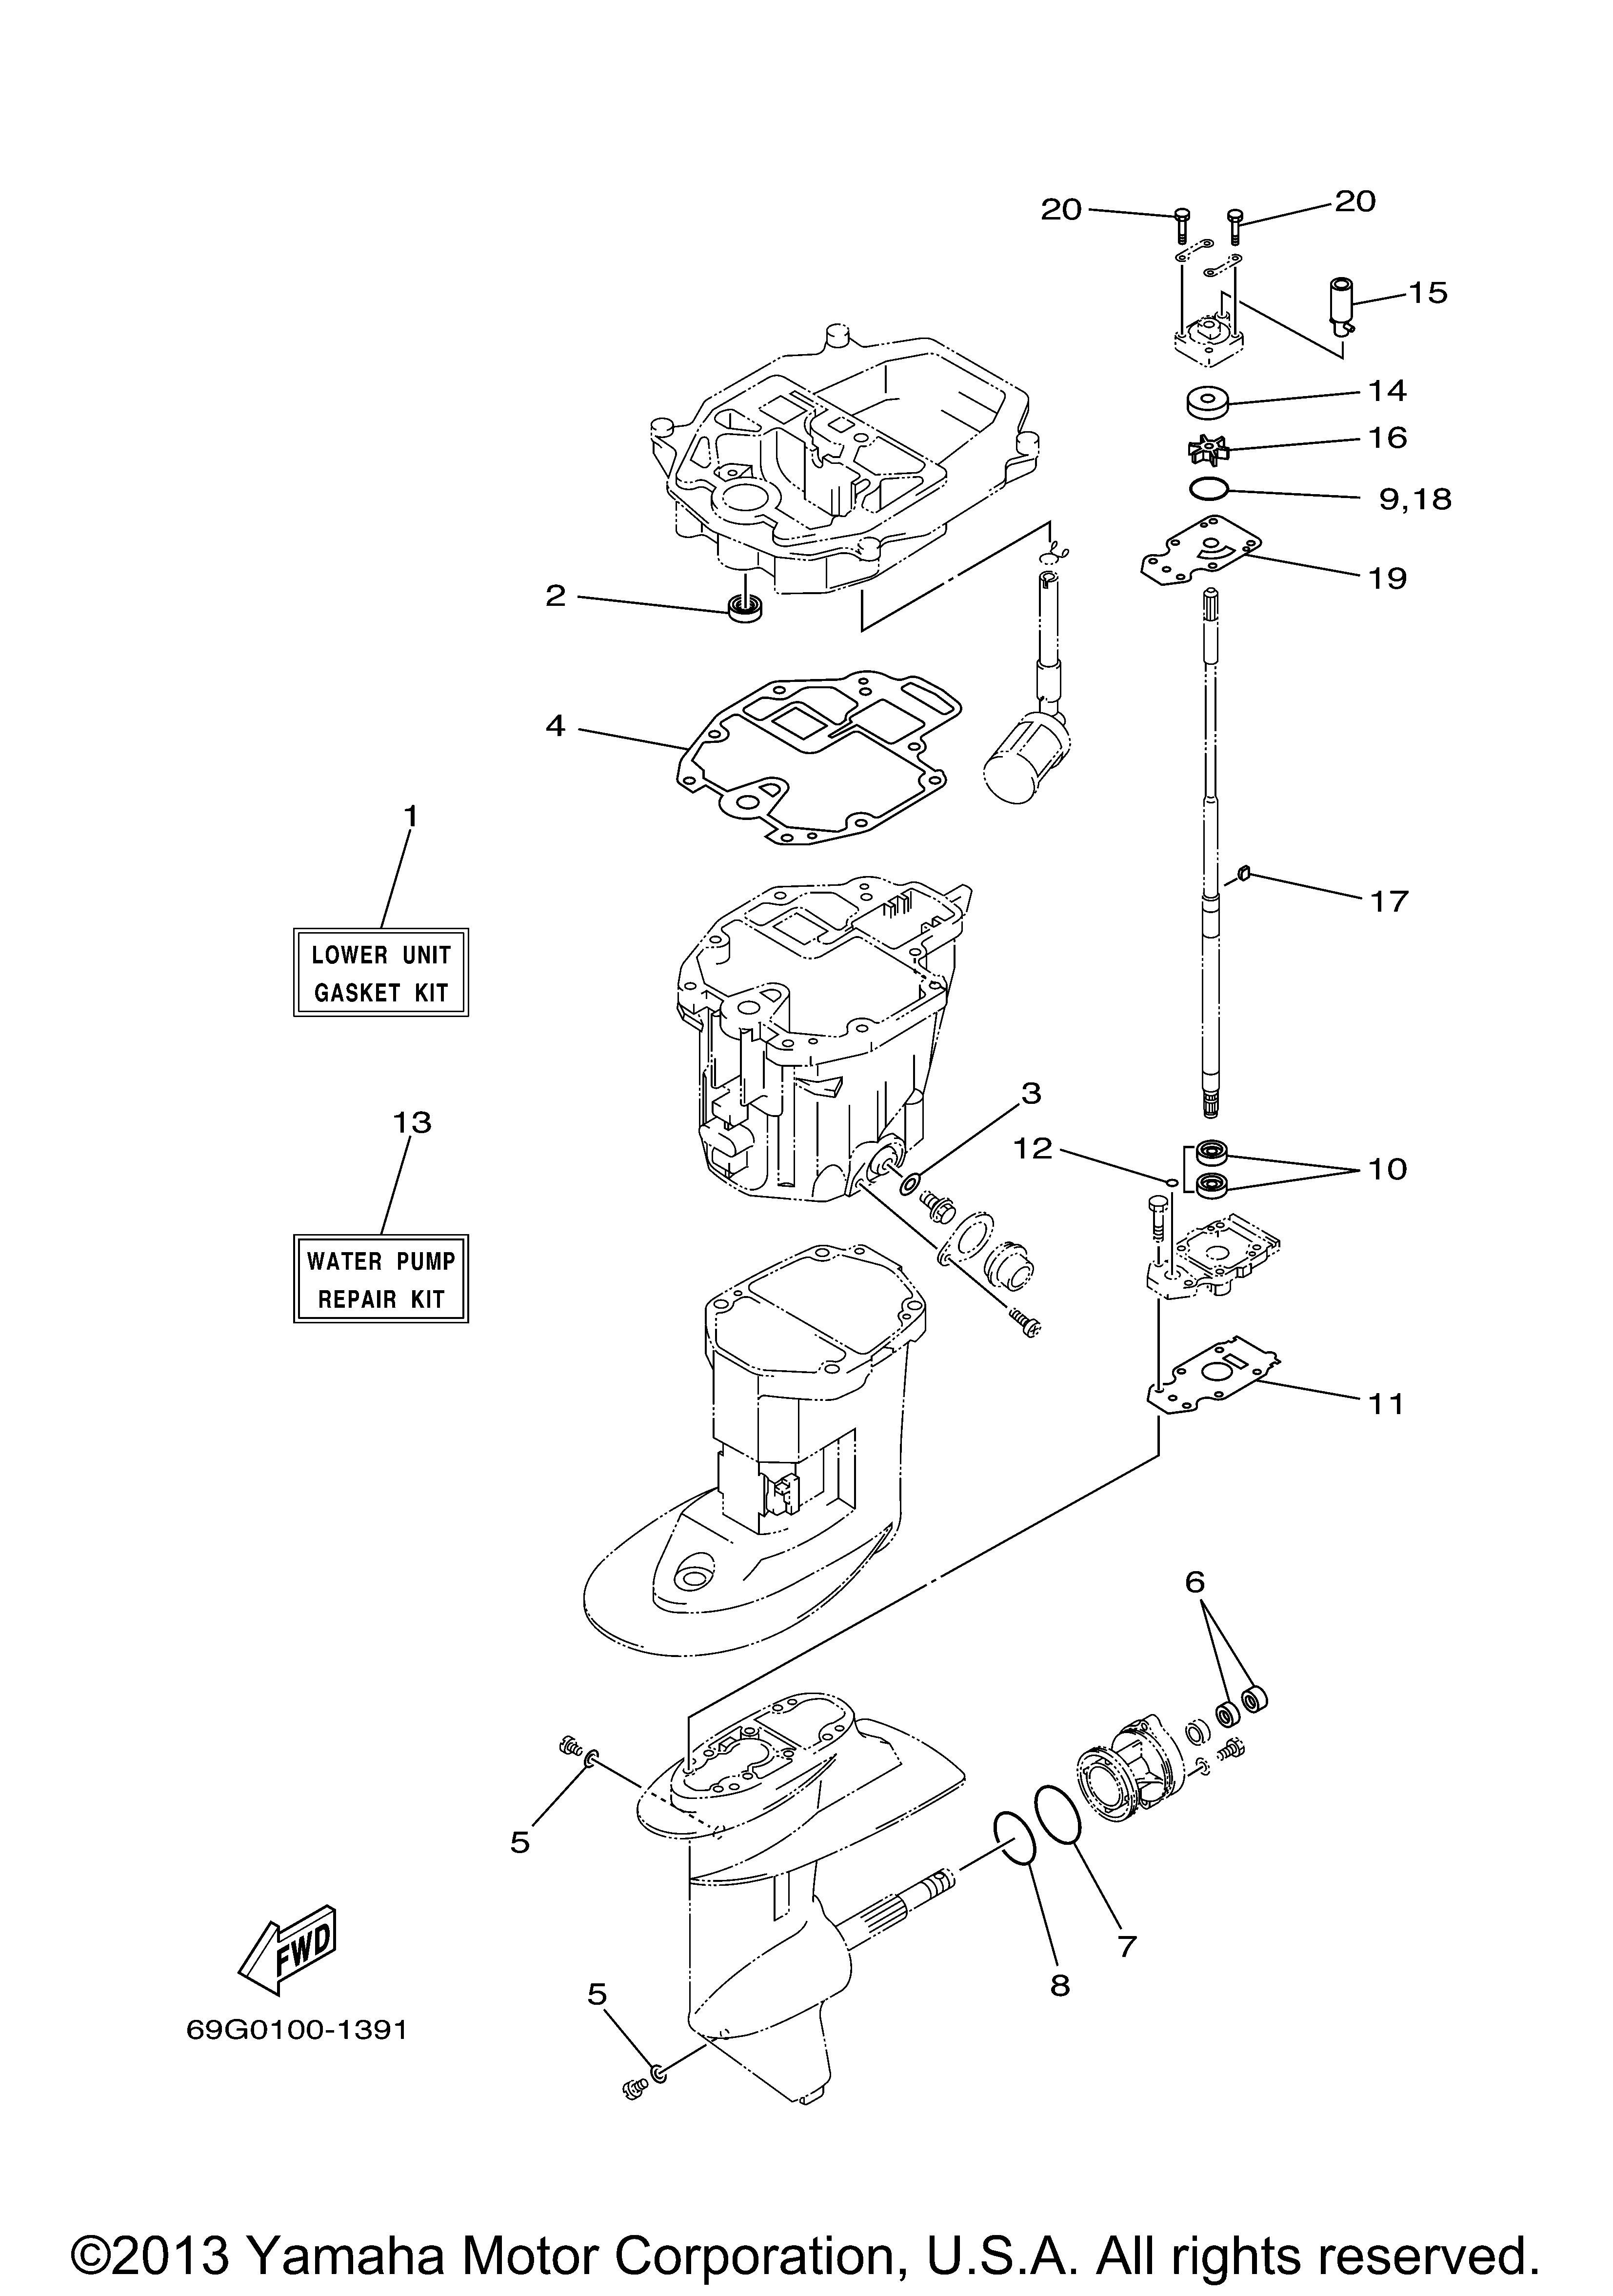 Yamaha Outboard 8 Hp T8pxr Repair Kit 3